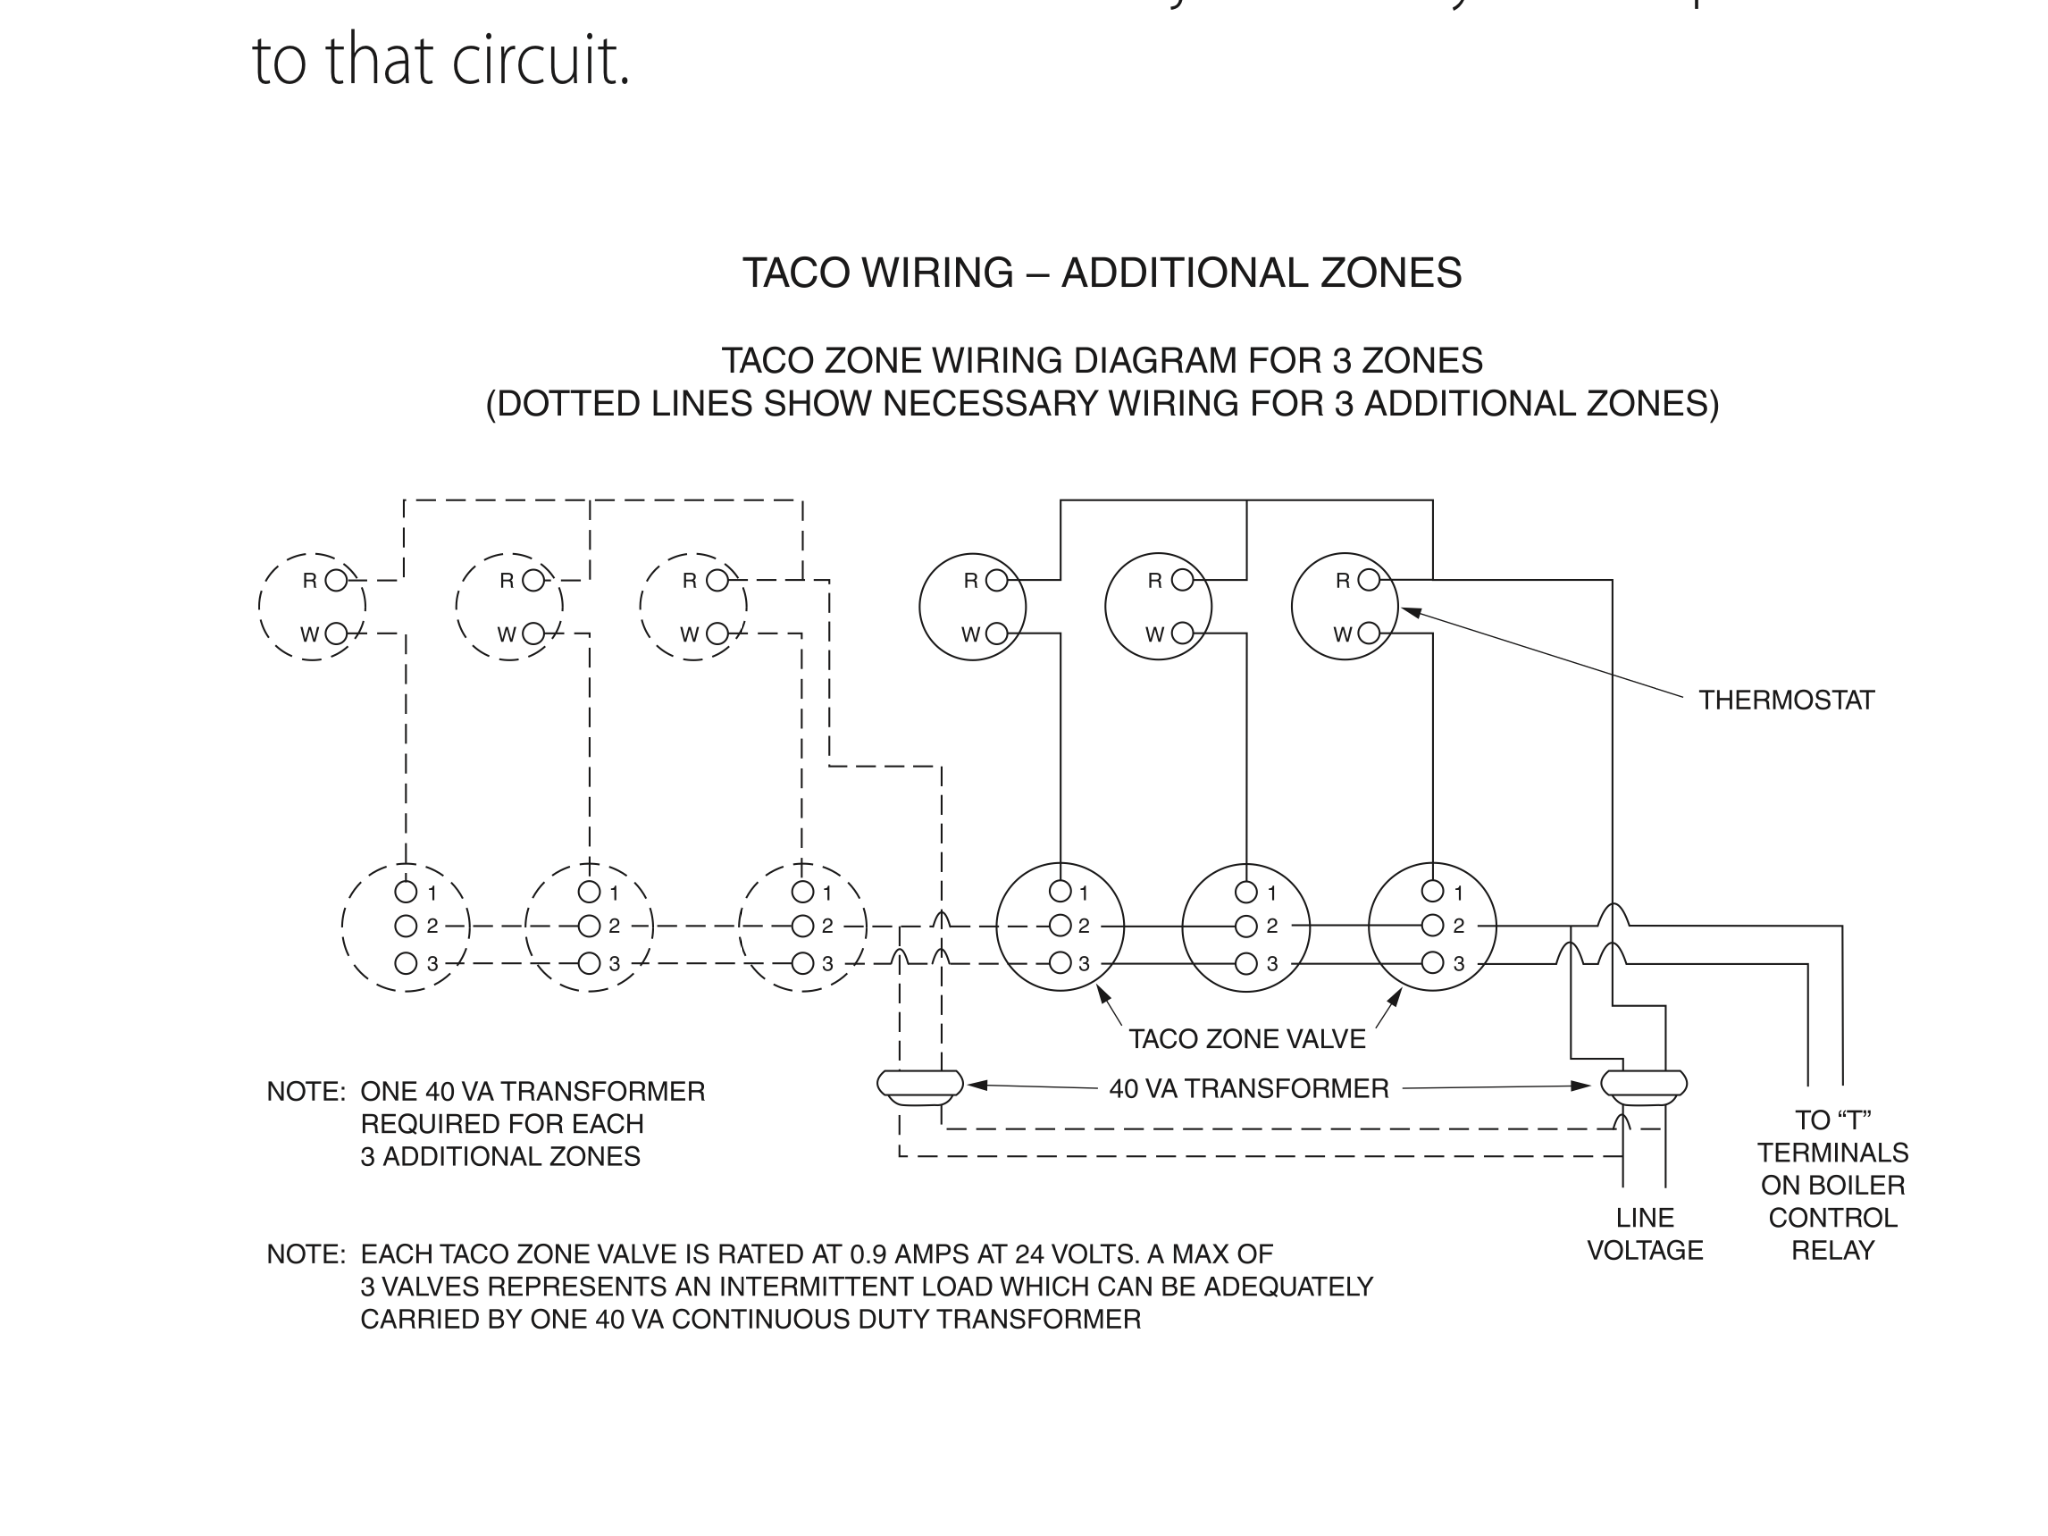 Taco Sentry Zone Valve Wiring Diagram